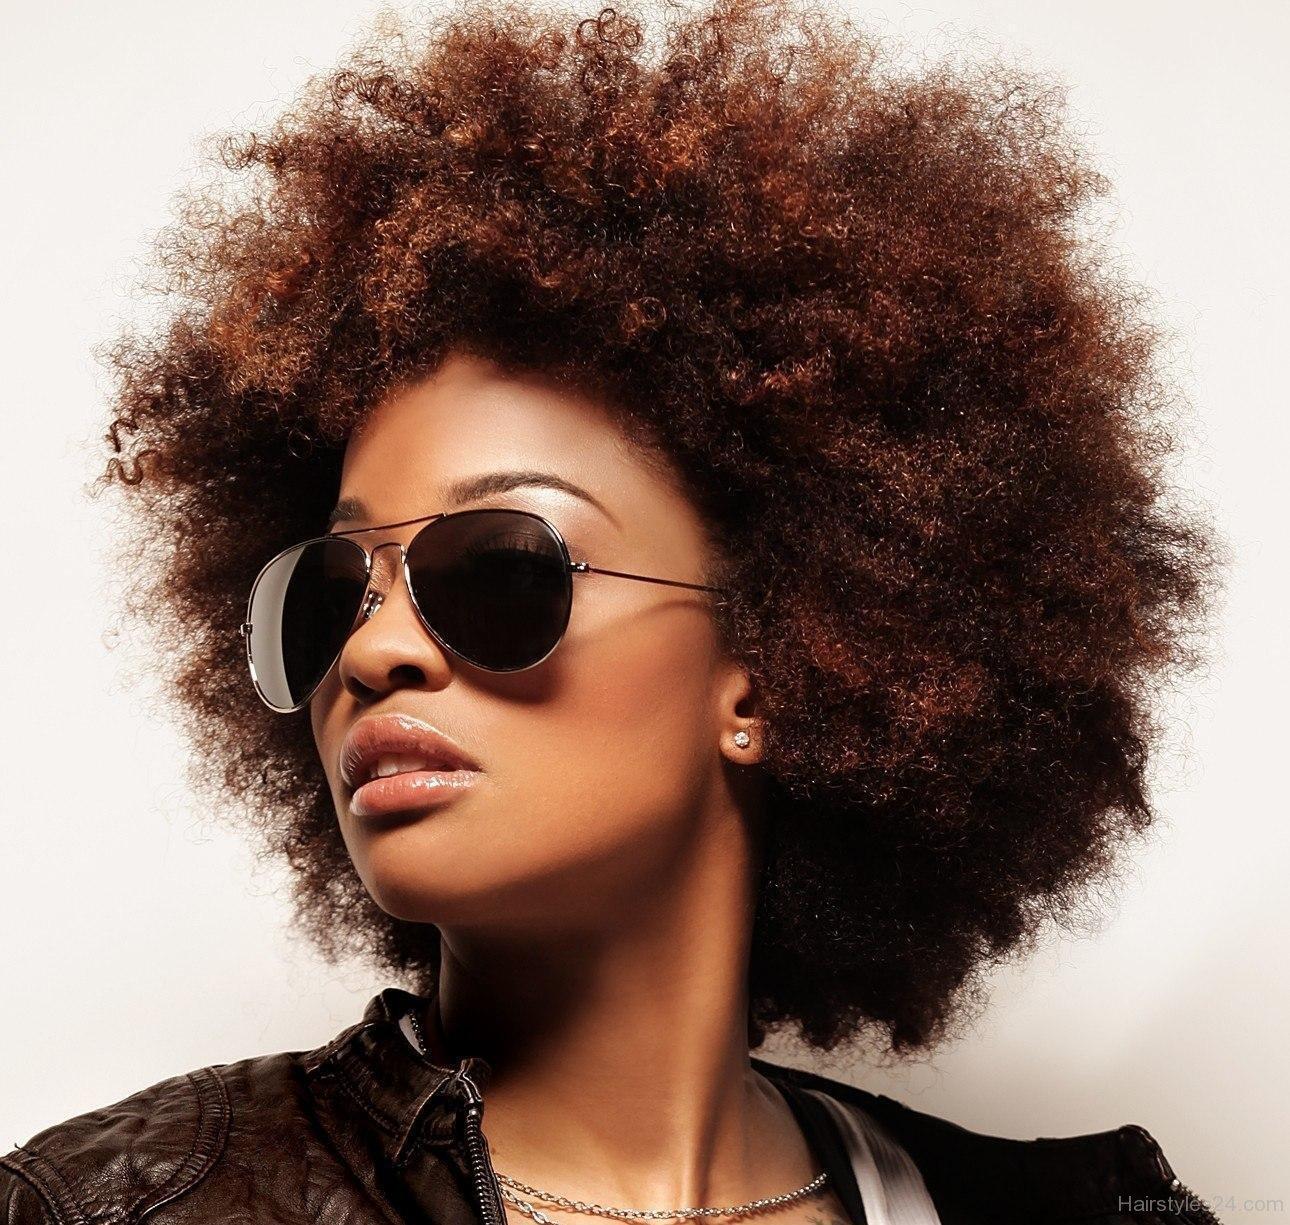 Afro-Hairstyles-for-Black-Women-3.jpg